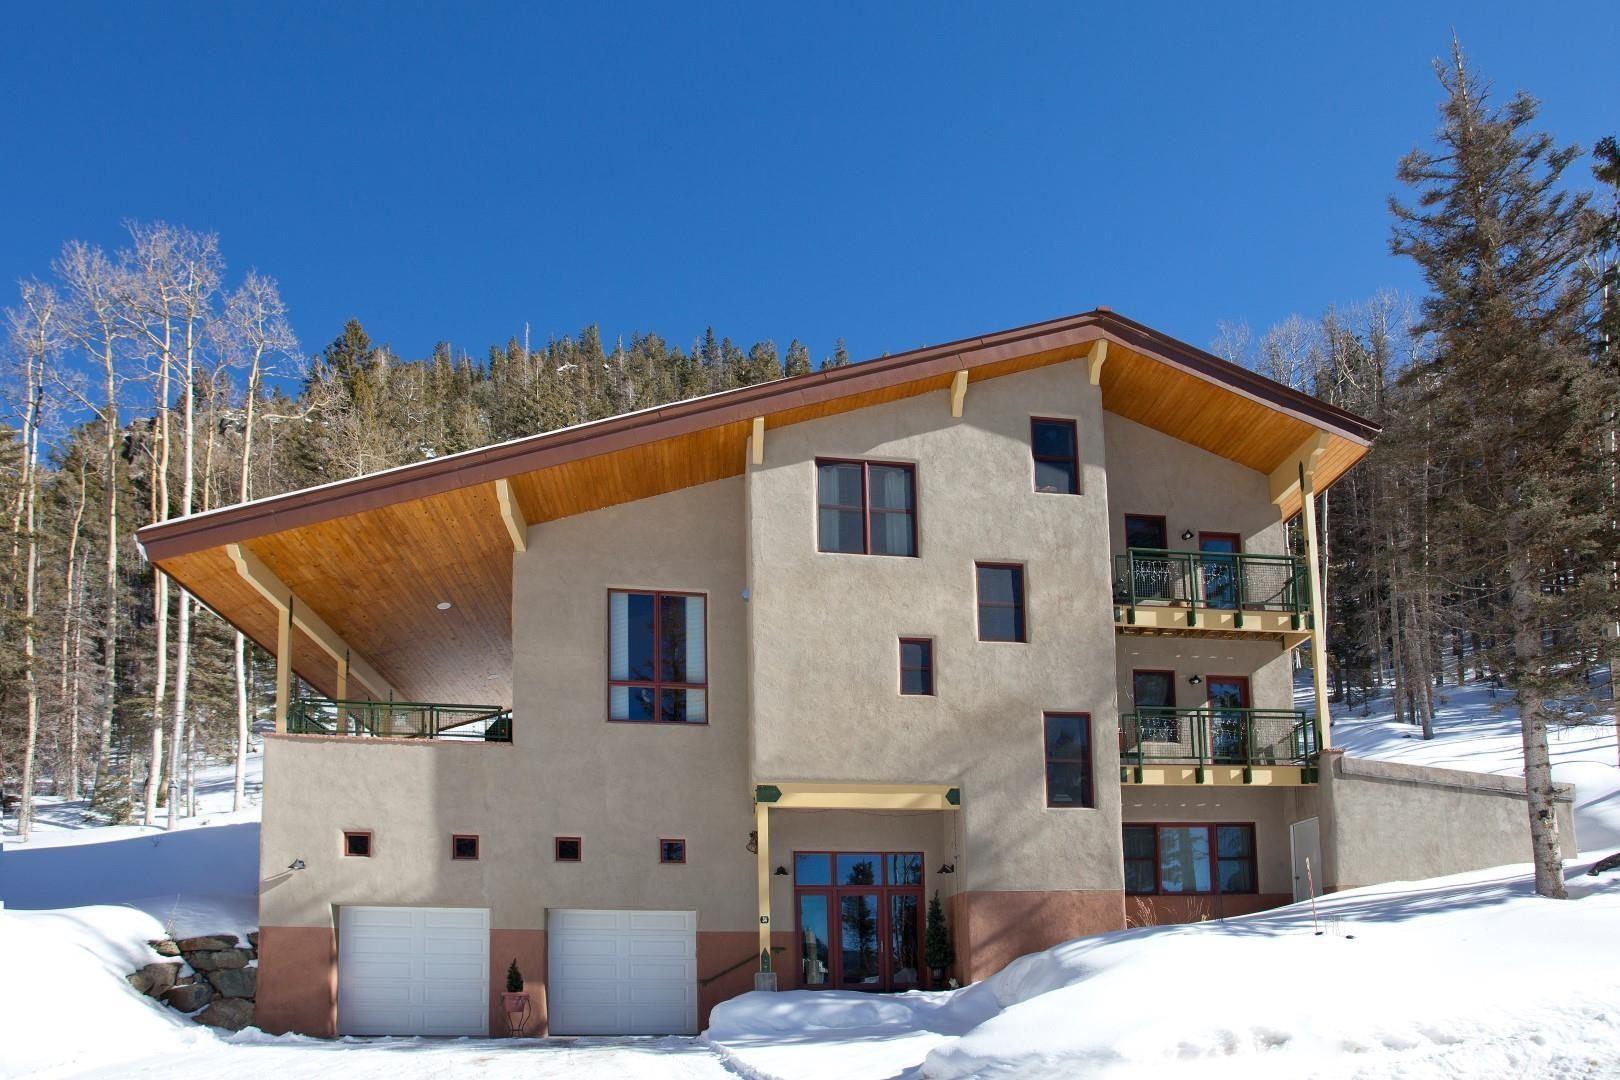 Photo for 34 Snowshoe Road, Taos Ski Valley, NM 87525 (MLS # 101589)